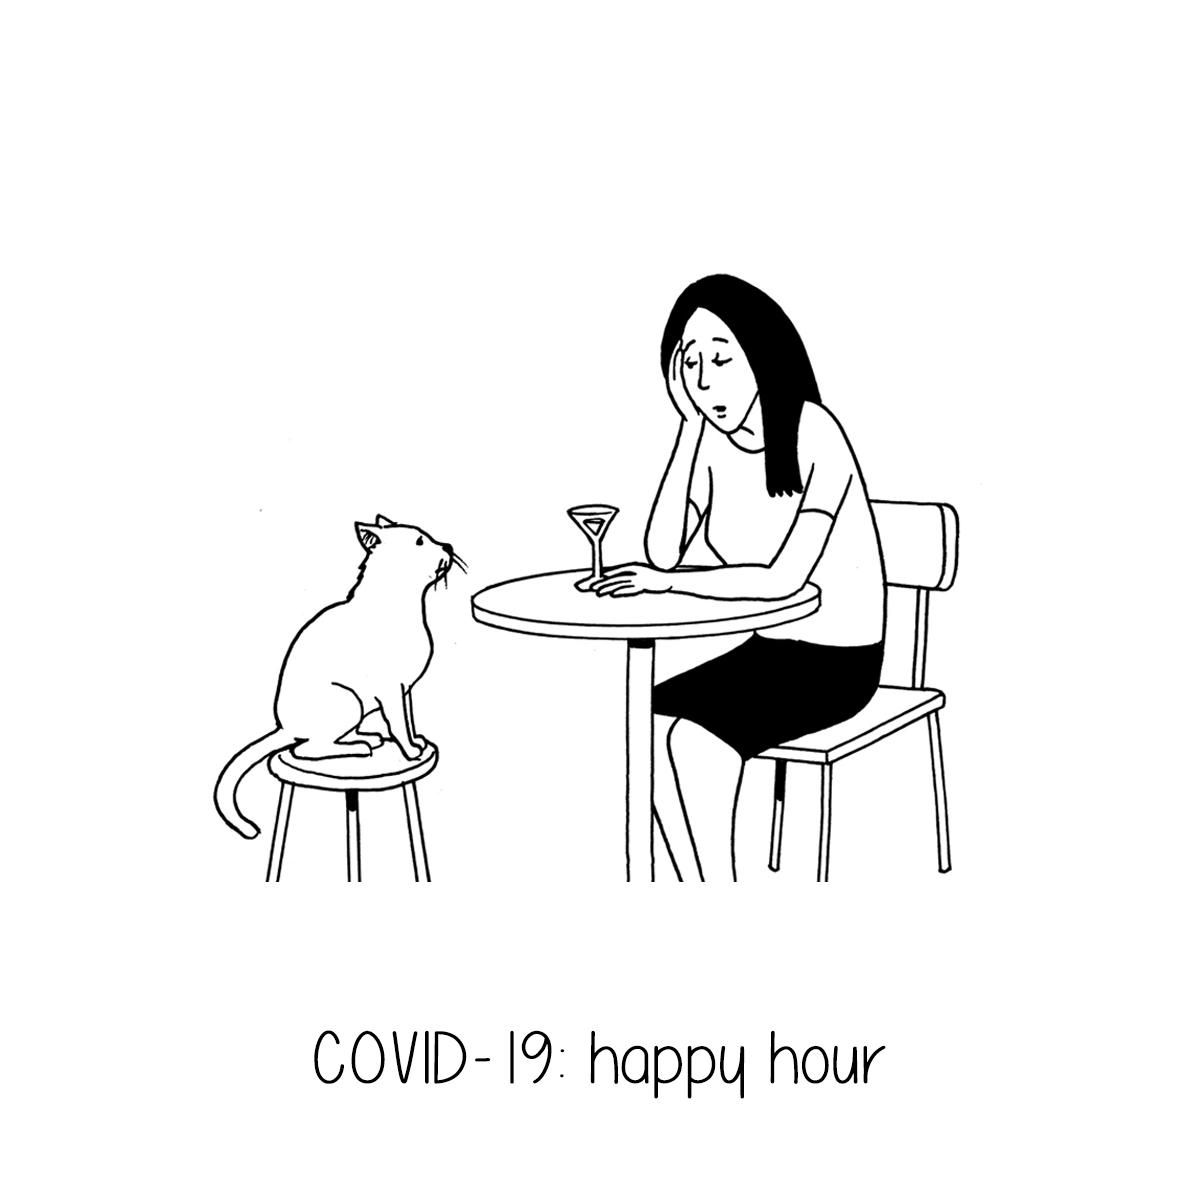 covid-19 sucks